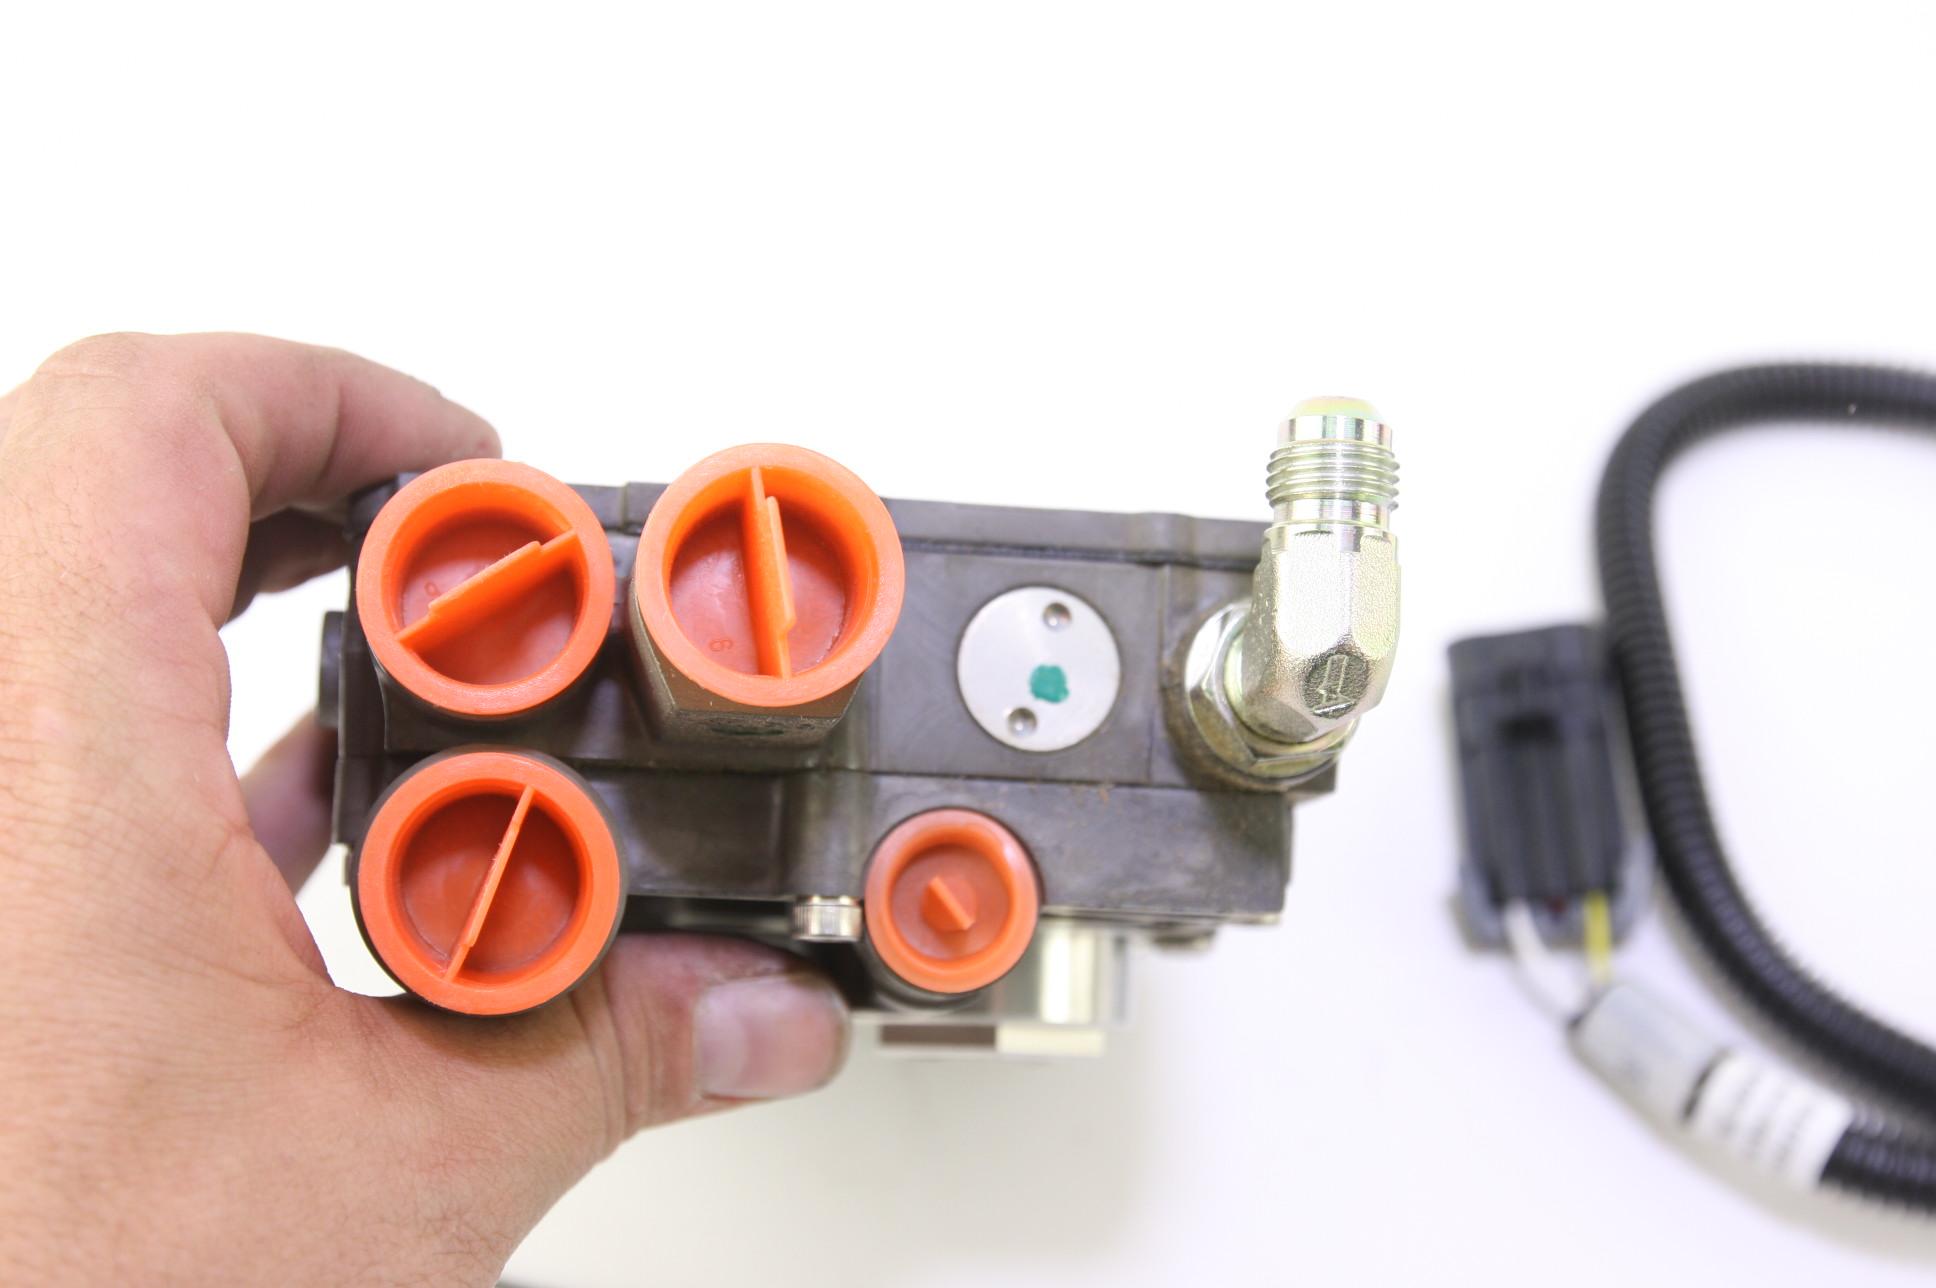 ~ New OEM 3L3Z9C968BB Ford Regulator - Fuel Pressure Free Shipping - image 3